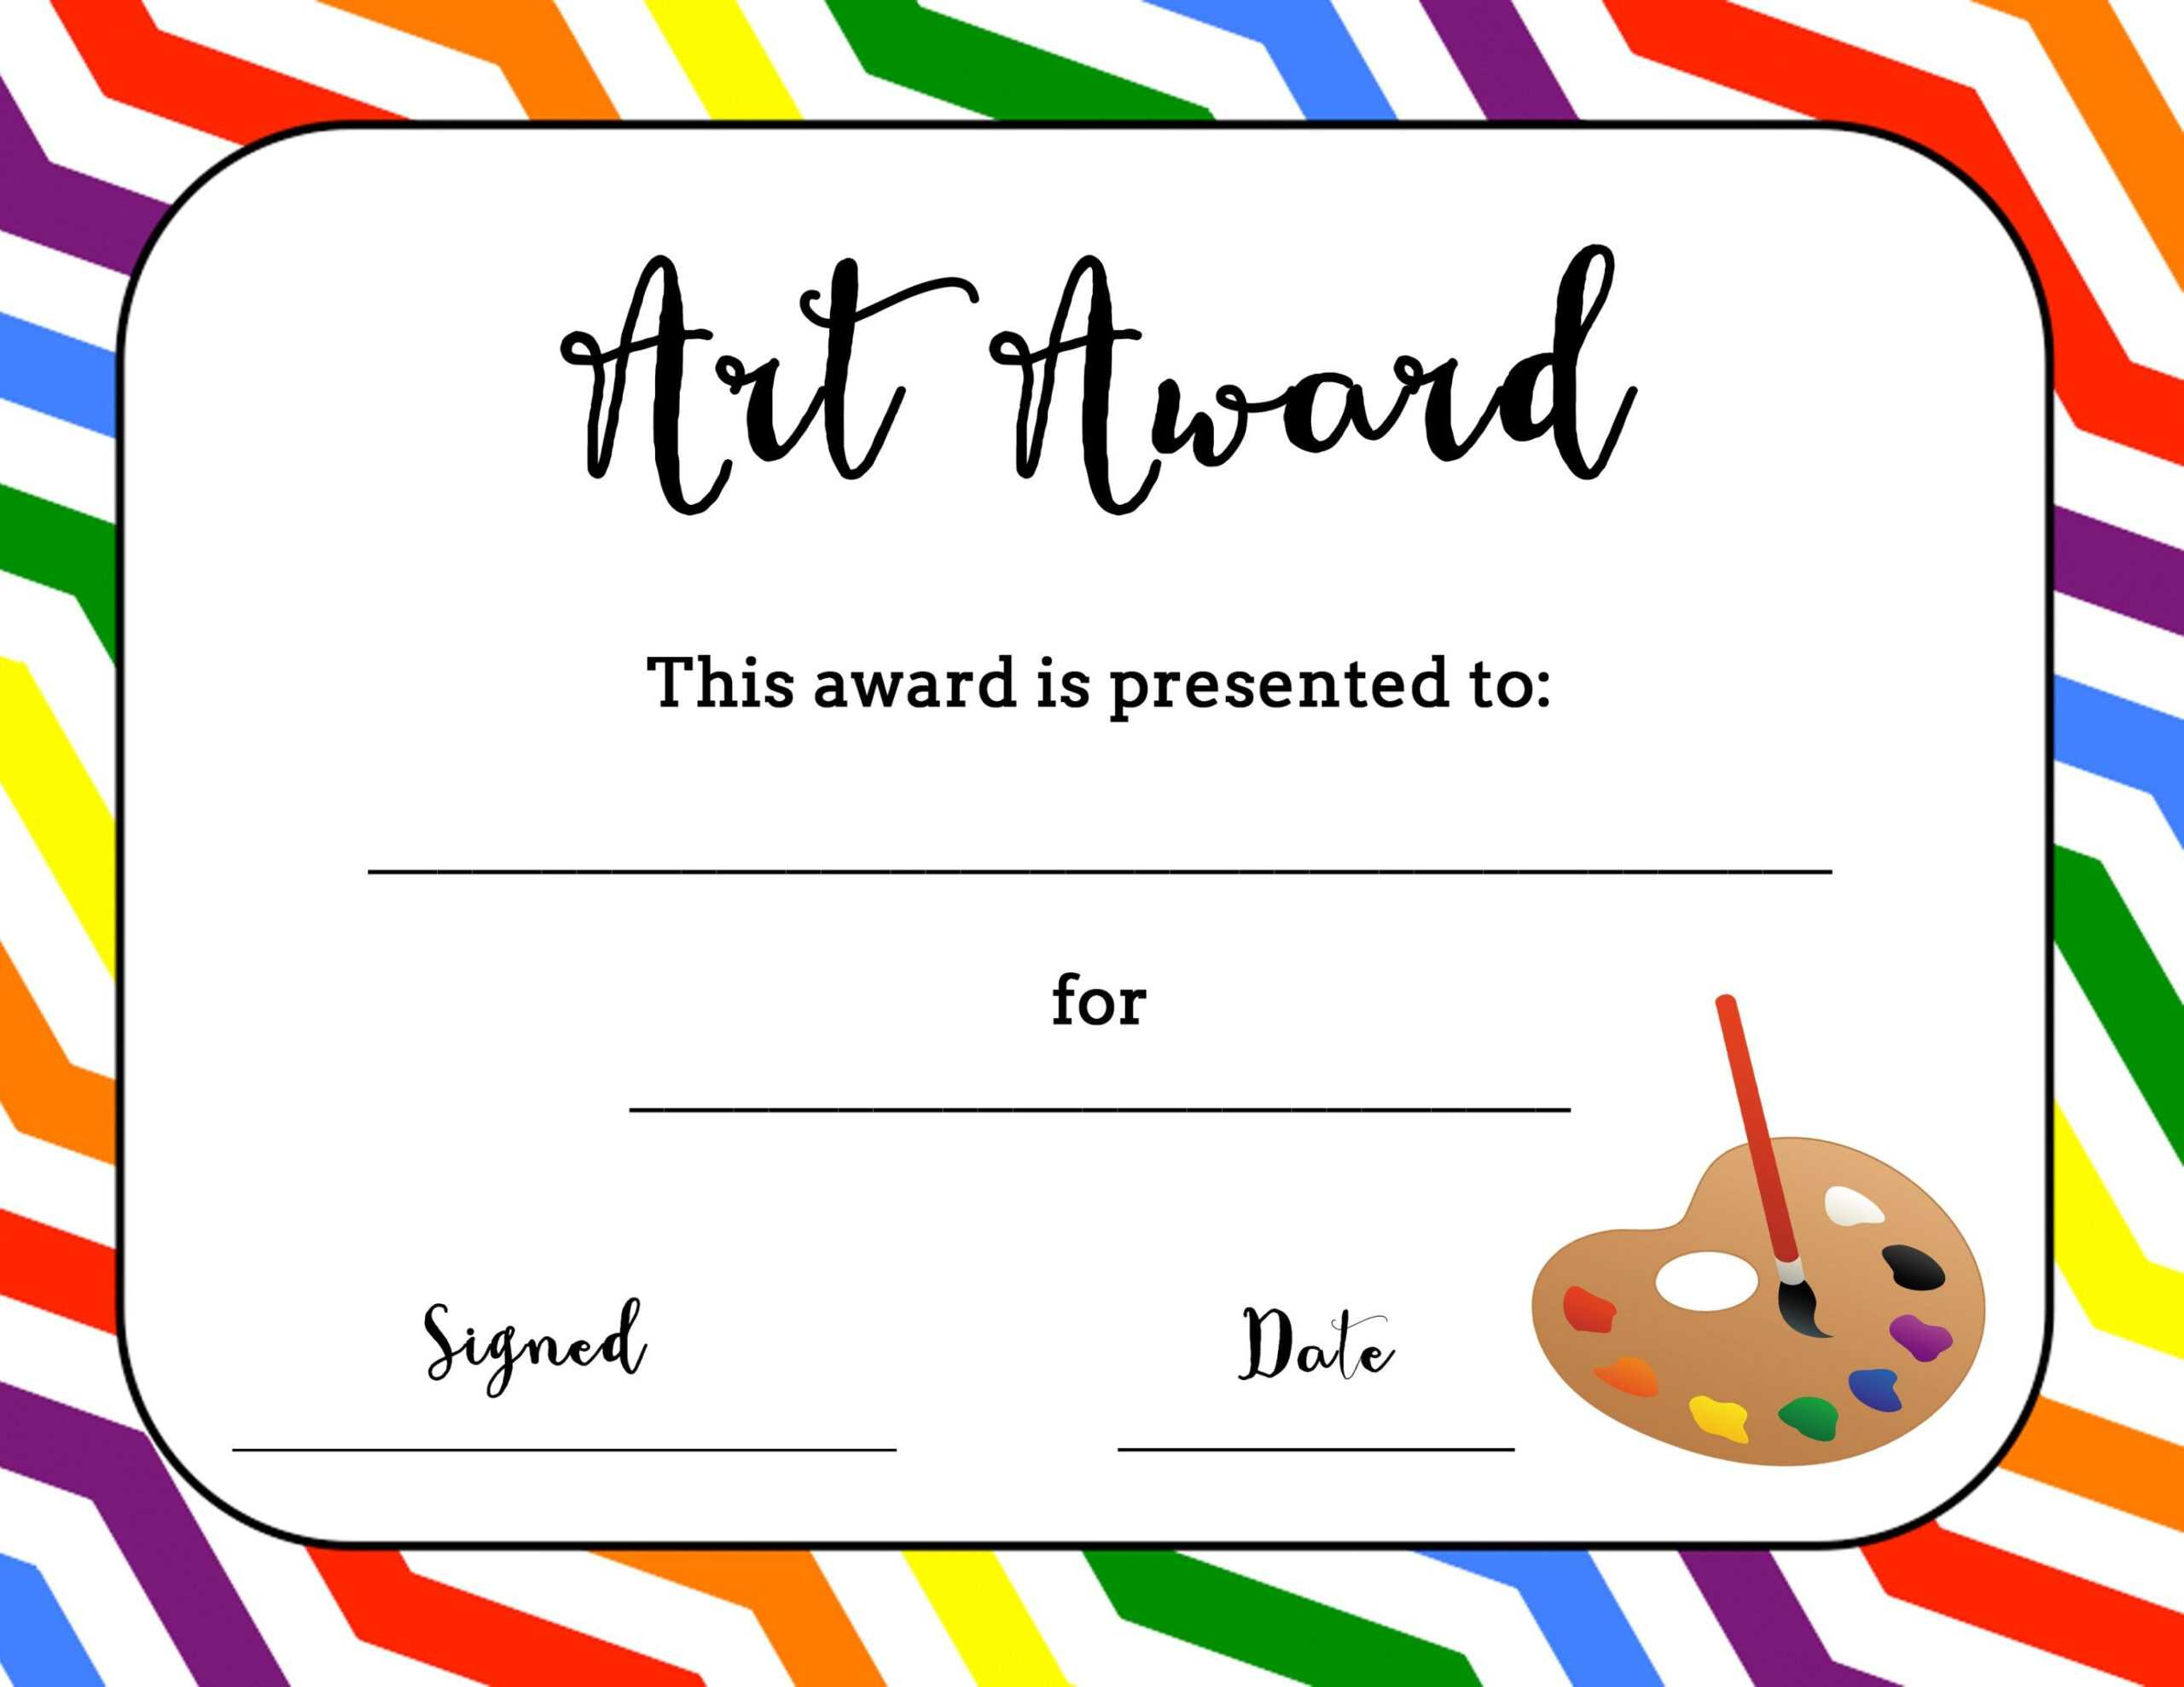 Art Award Certificate (Free Printable) | Art Classroom pertaining to Free Art Certificate Templates